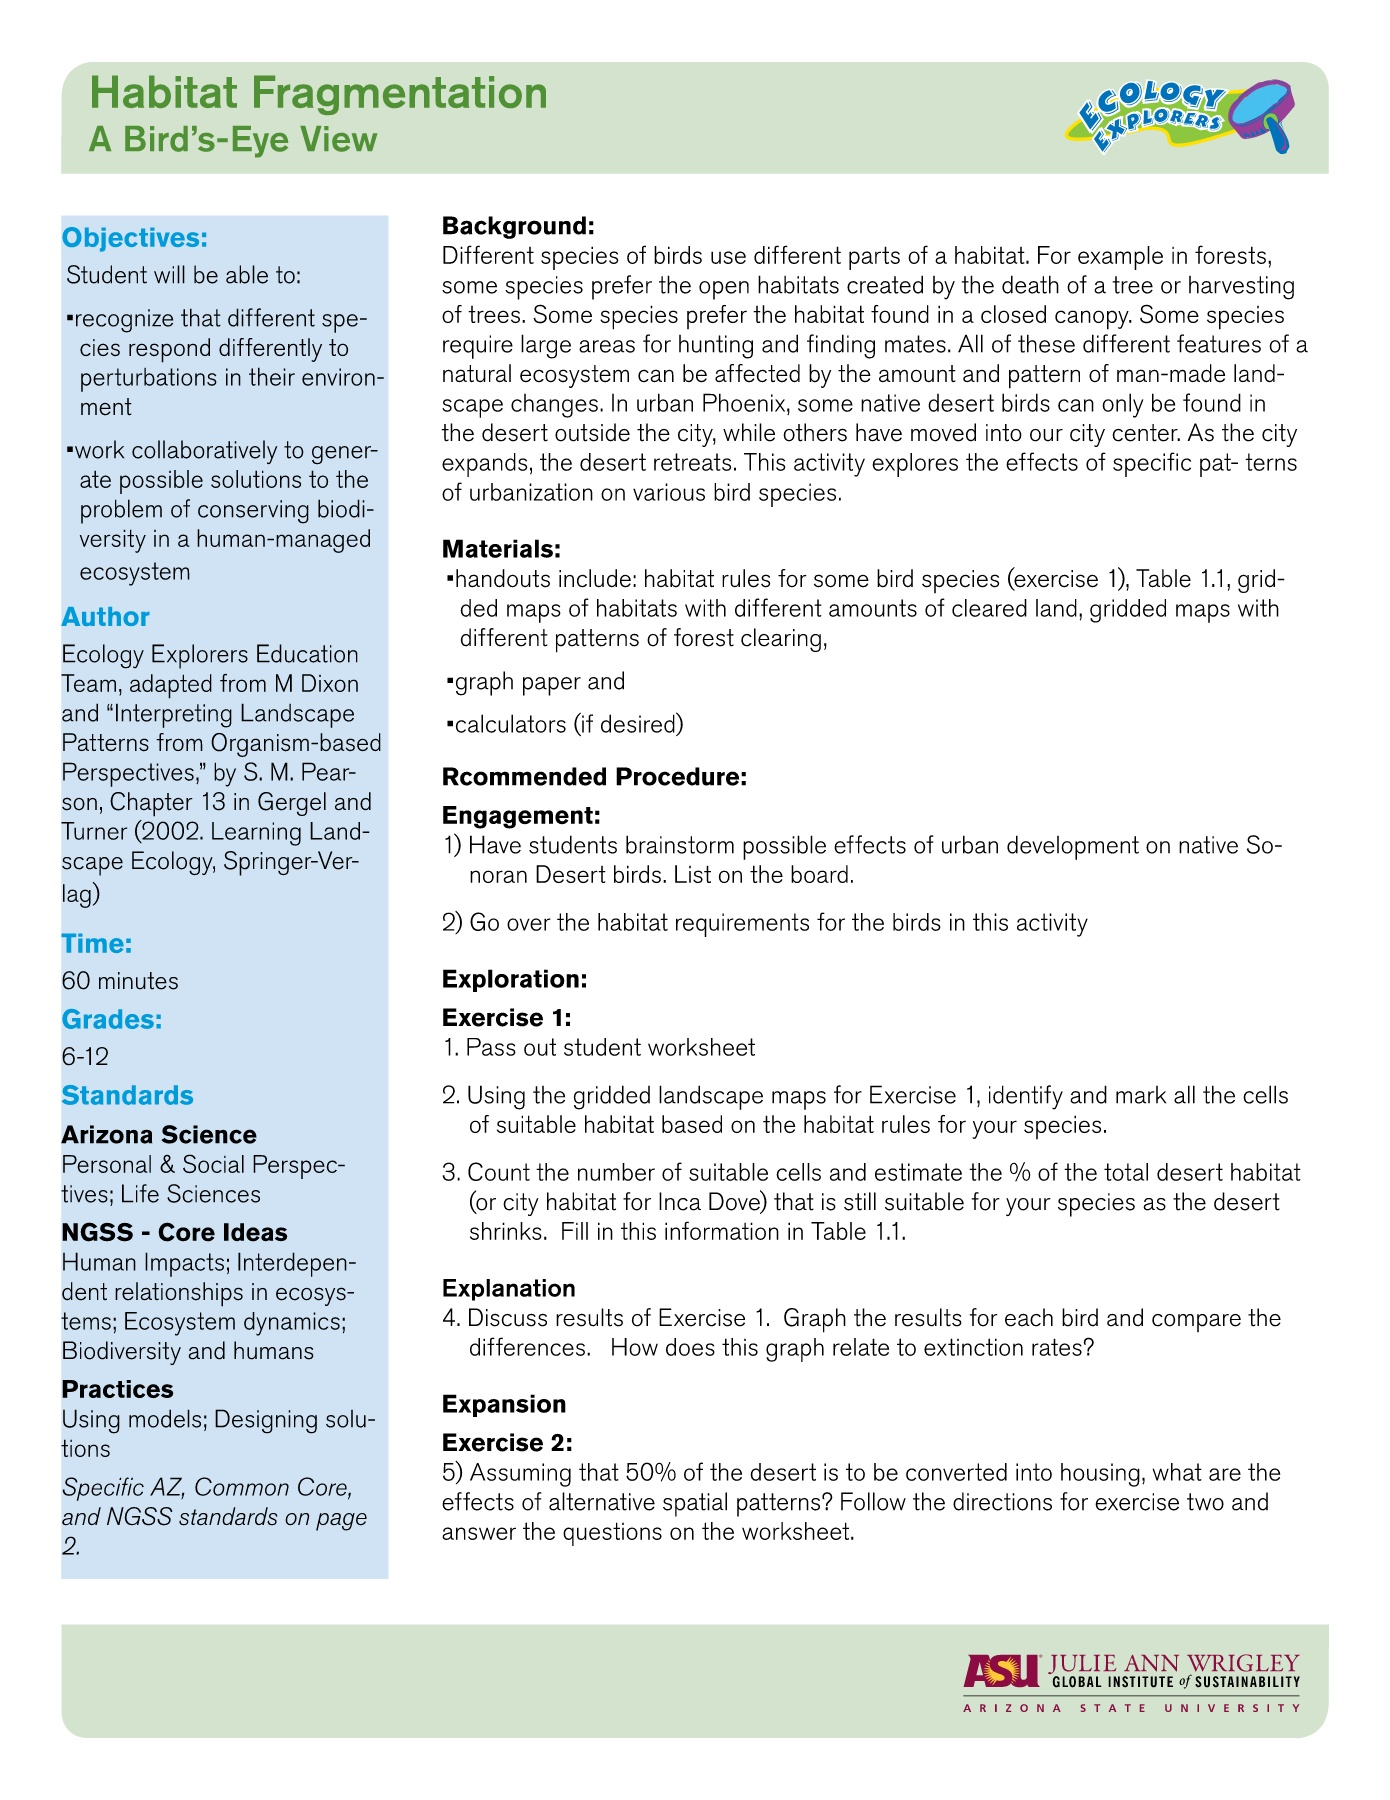 medium resolution of Habitat-Fragmentation-A-Birds-Eye-View-Flip eBook Pages 1 - 7  AnyFlip    AnyFlip